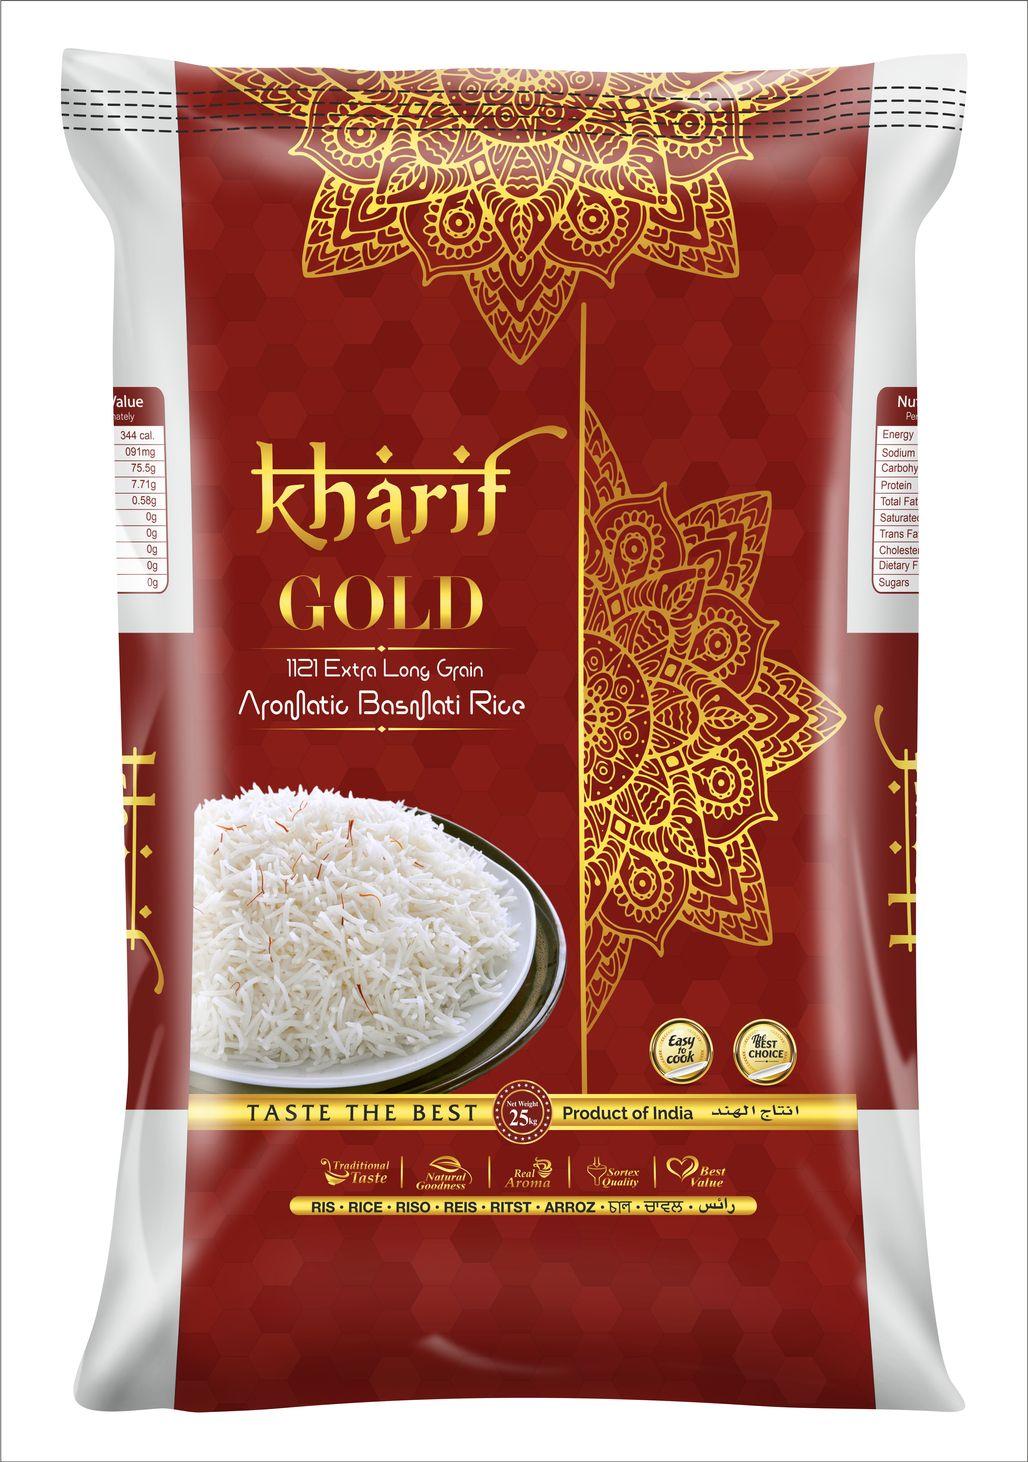 Karif-GOLD-25-kg